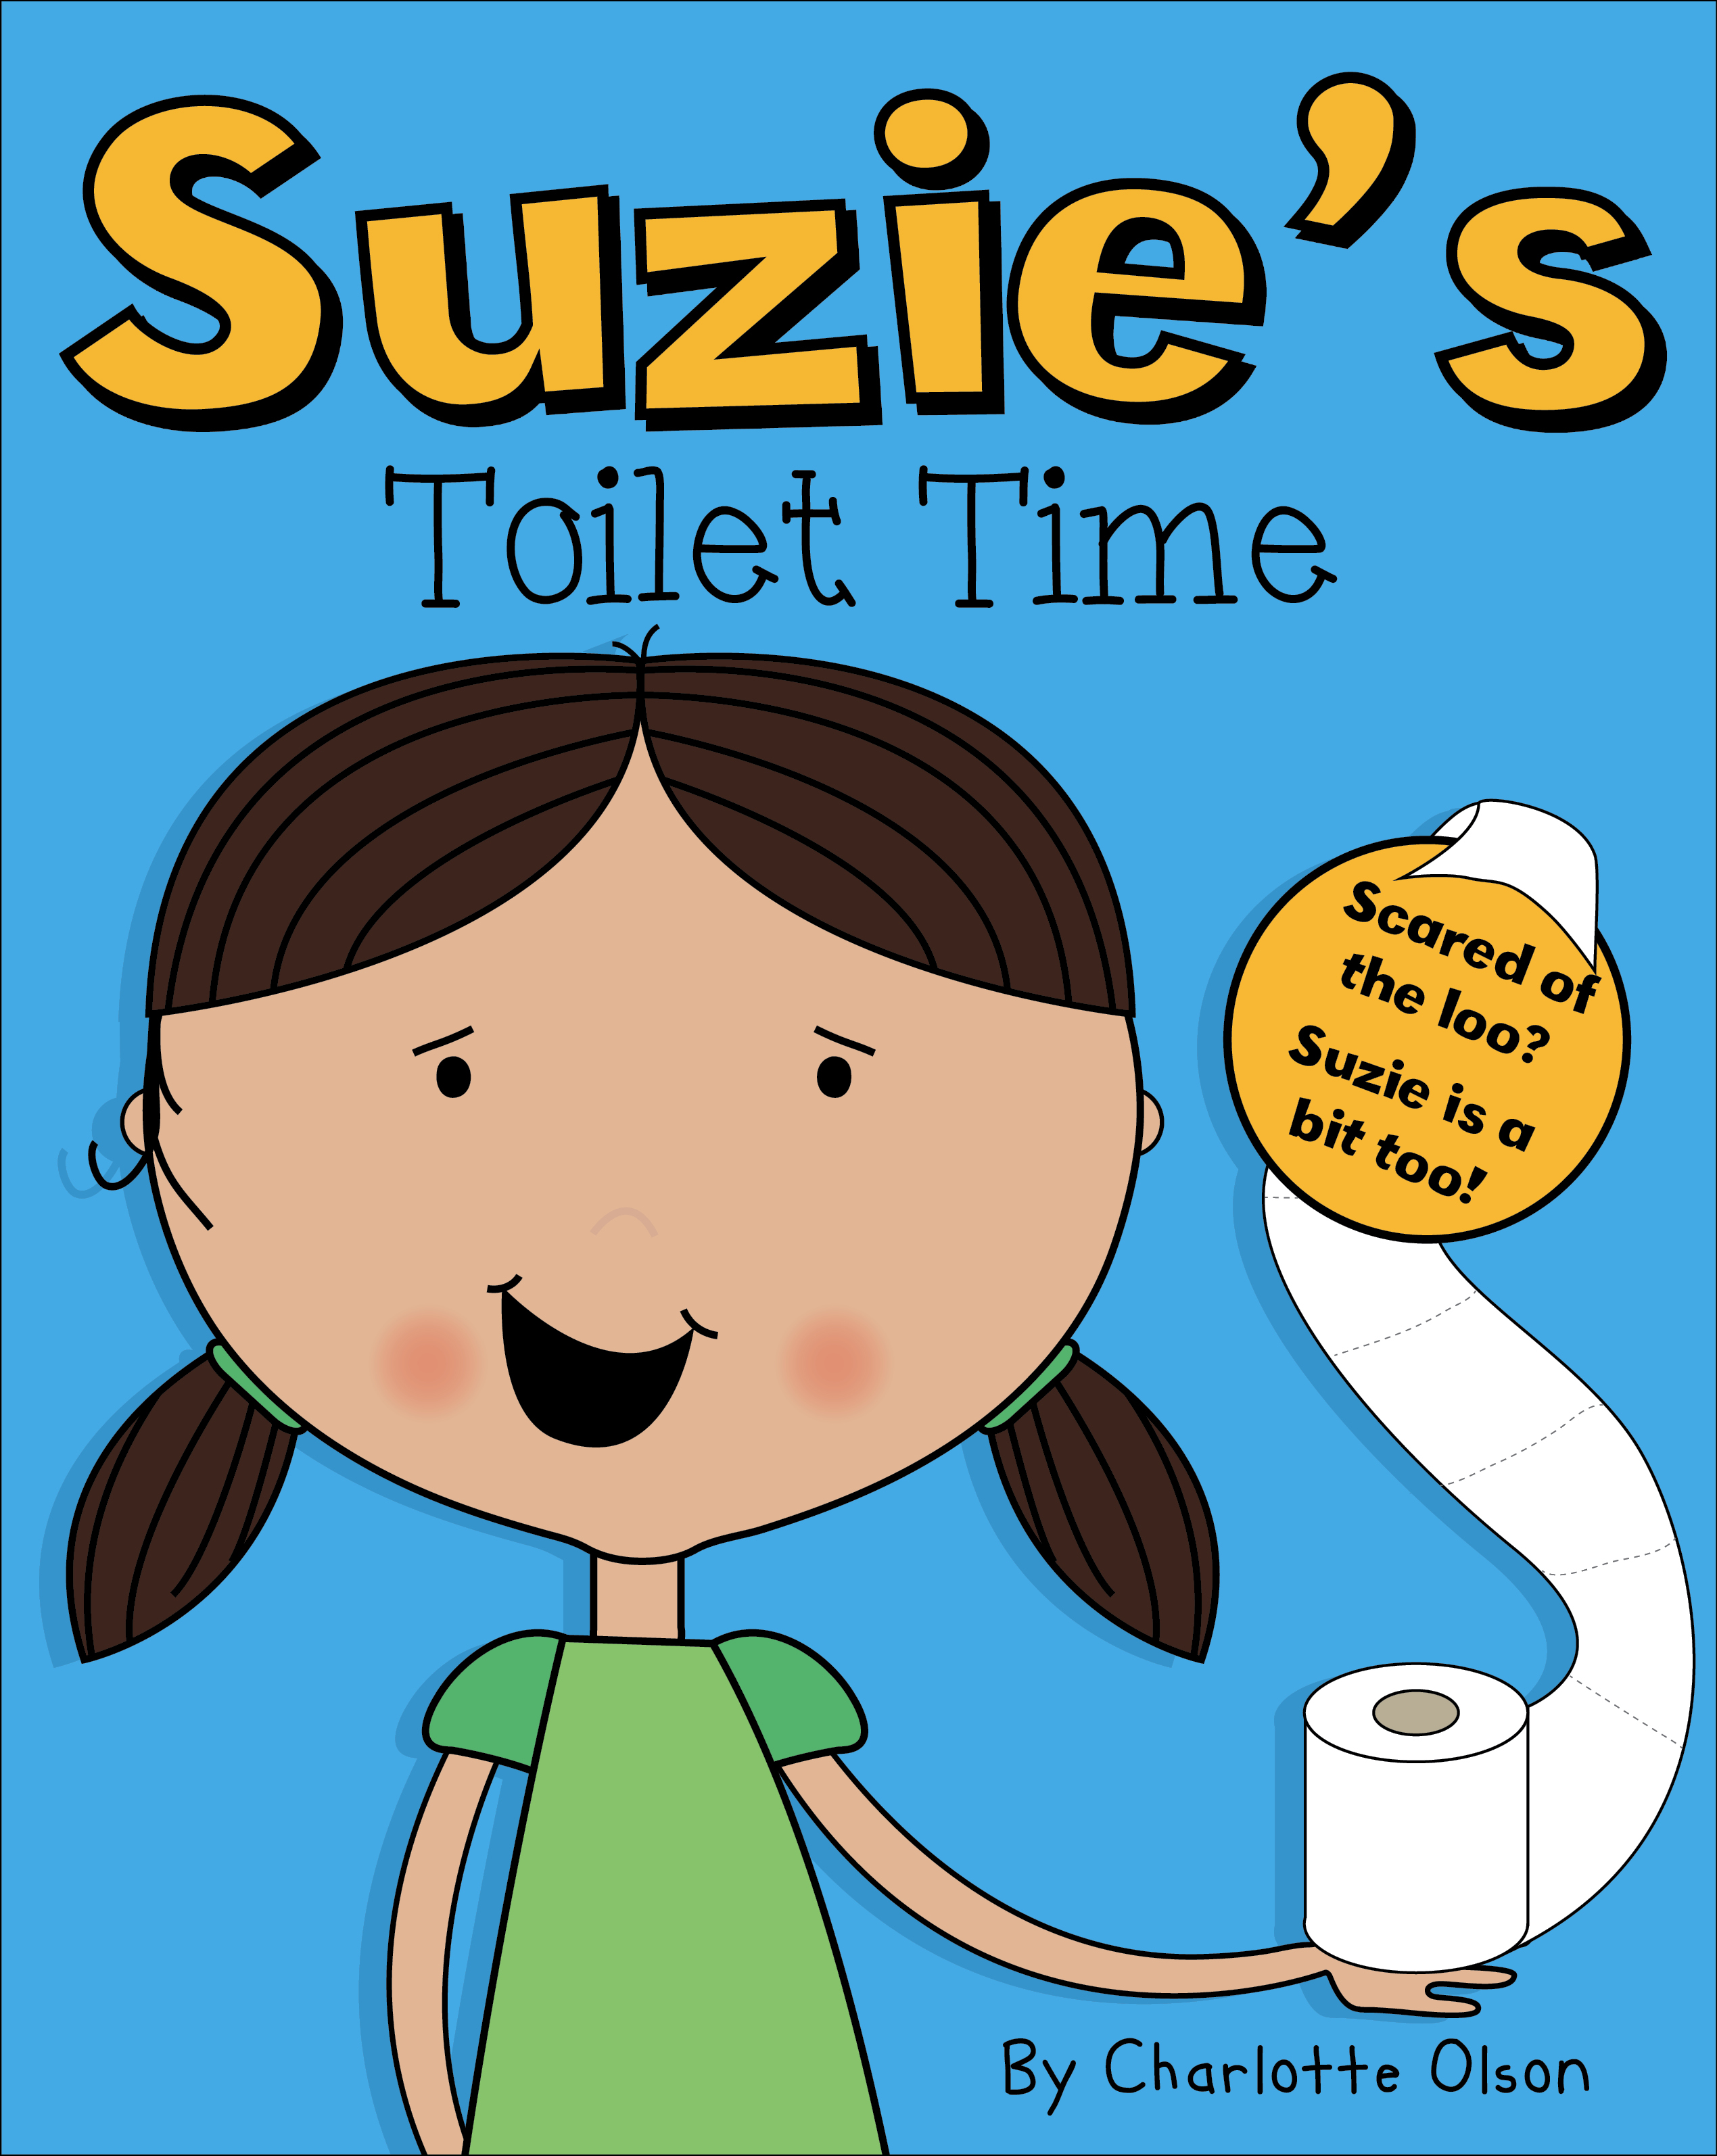 suzies-toilet-book.jpg